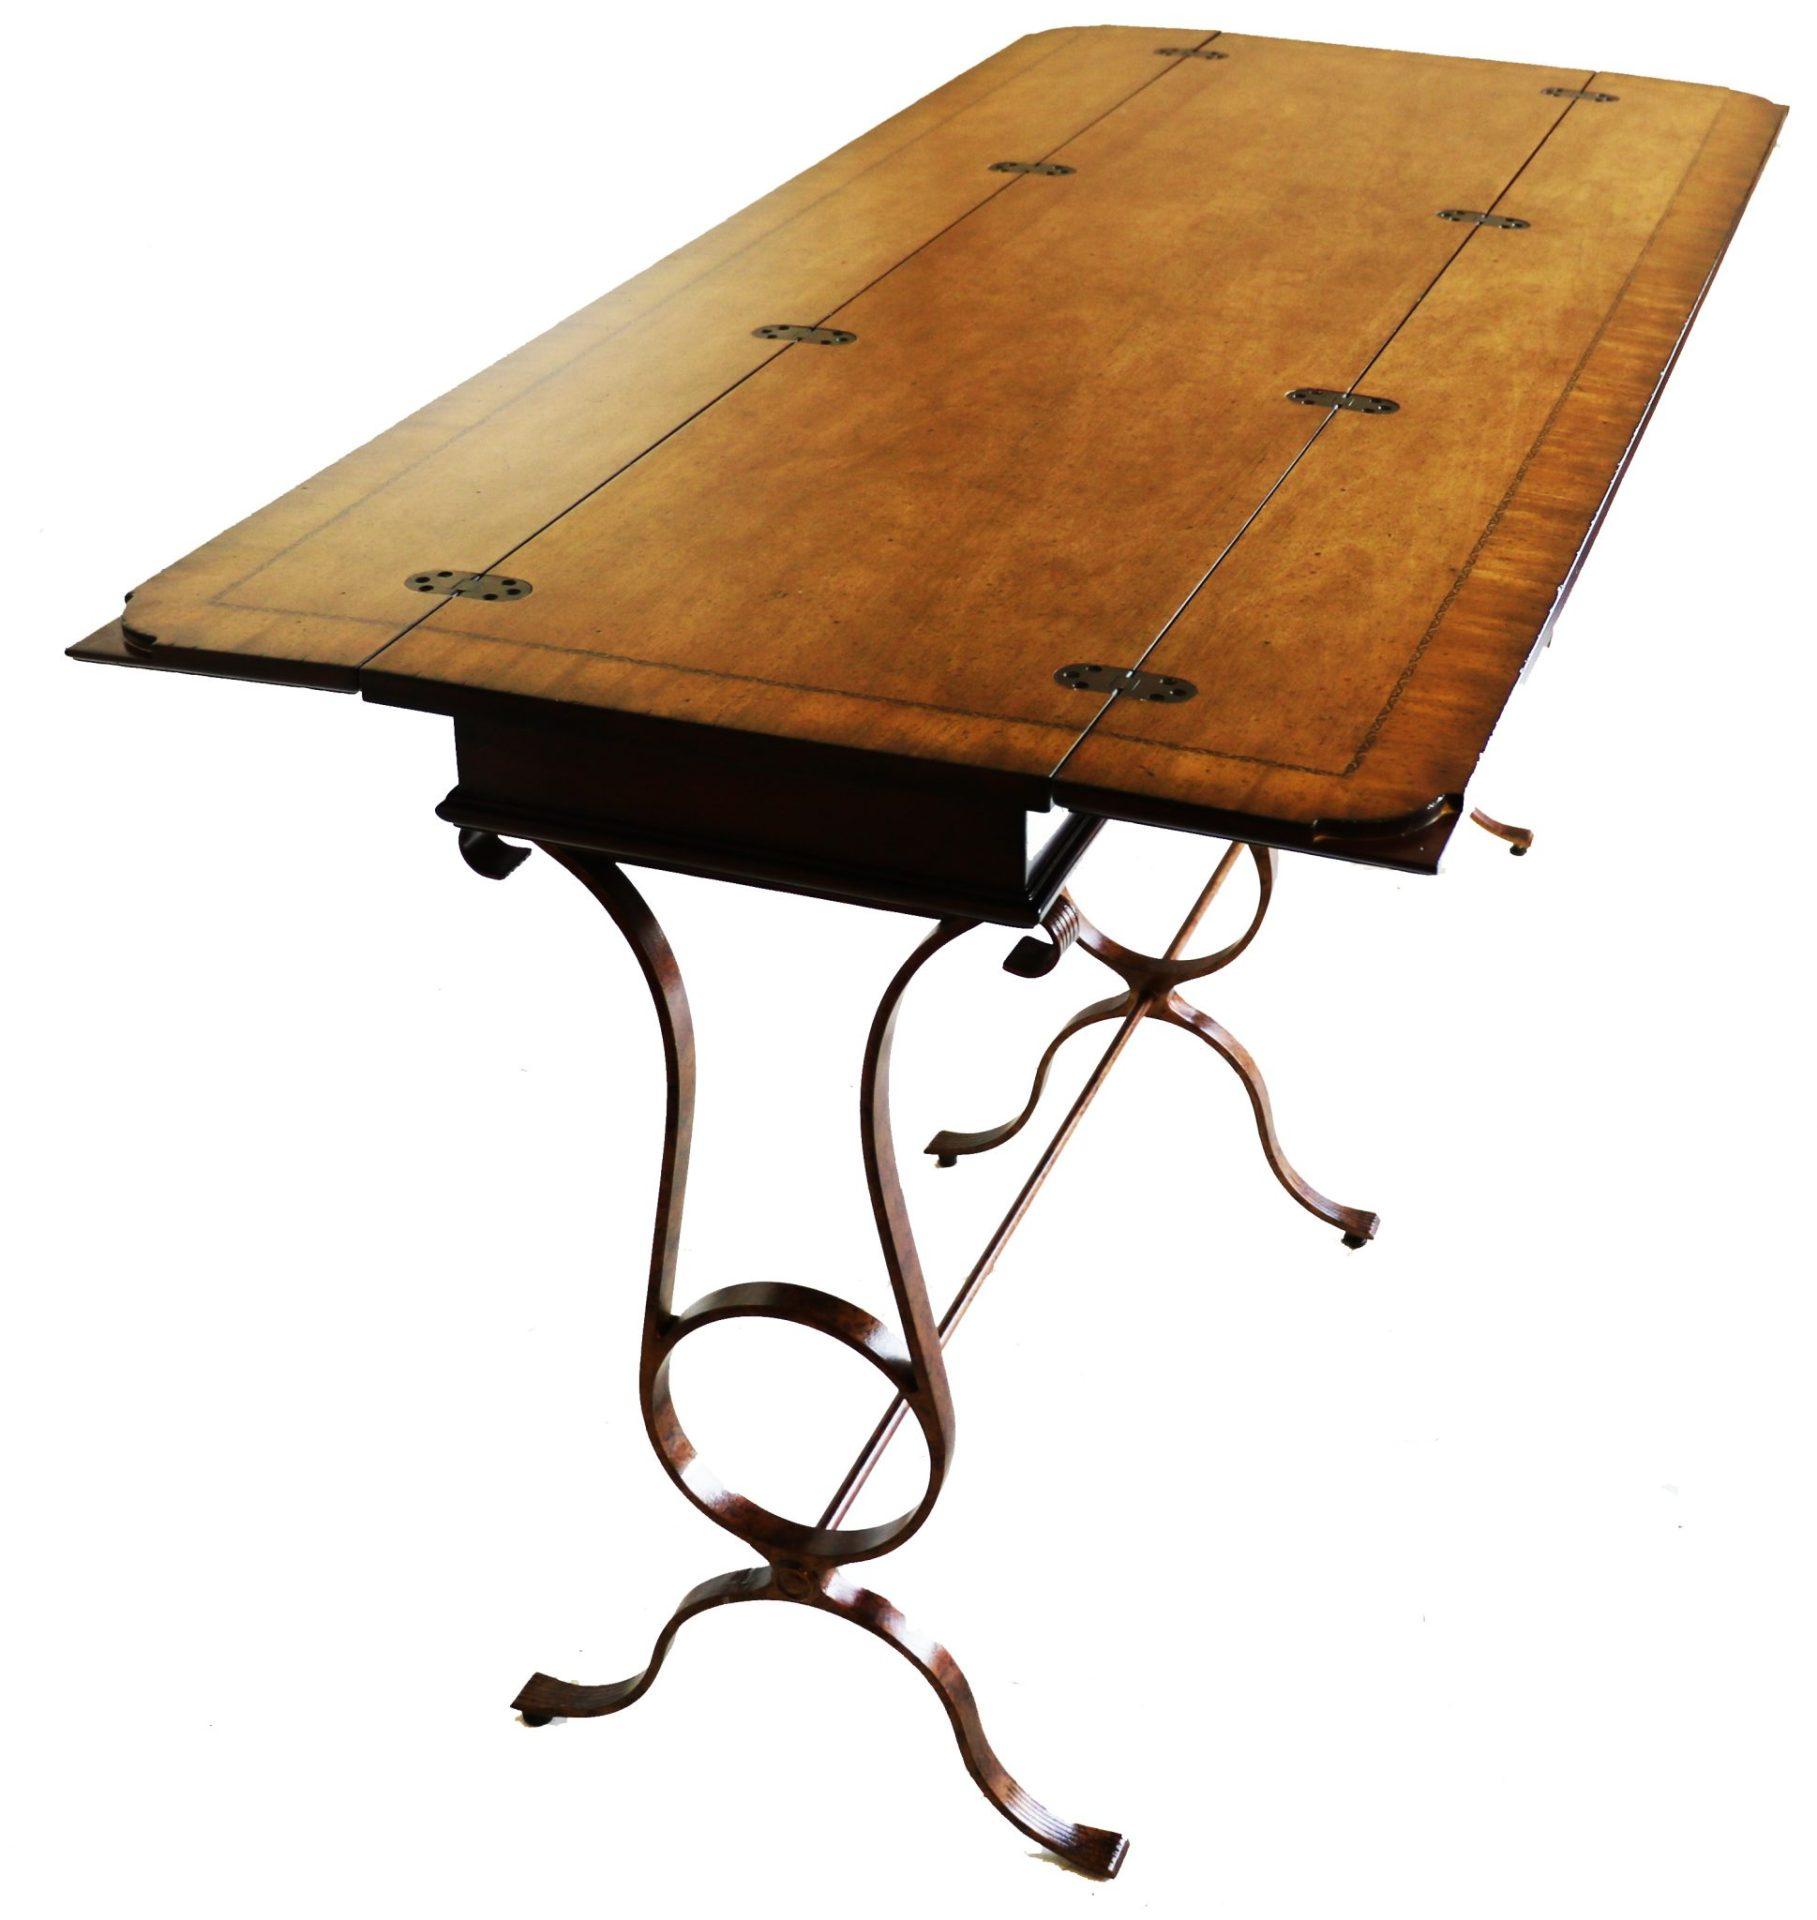 stanley furniture flip top console table. Black Bedroom Furniture Sets. Home Design Ideas